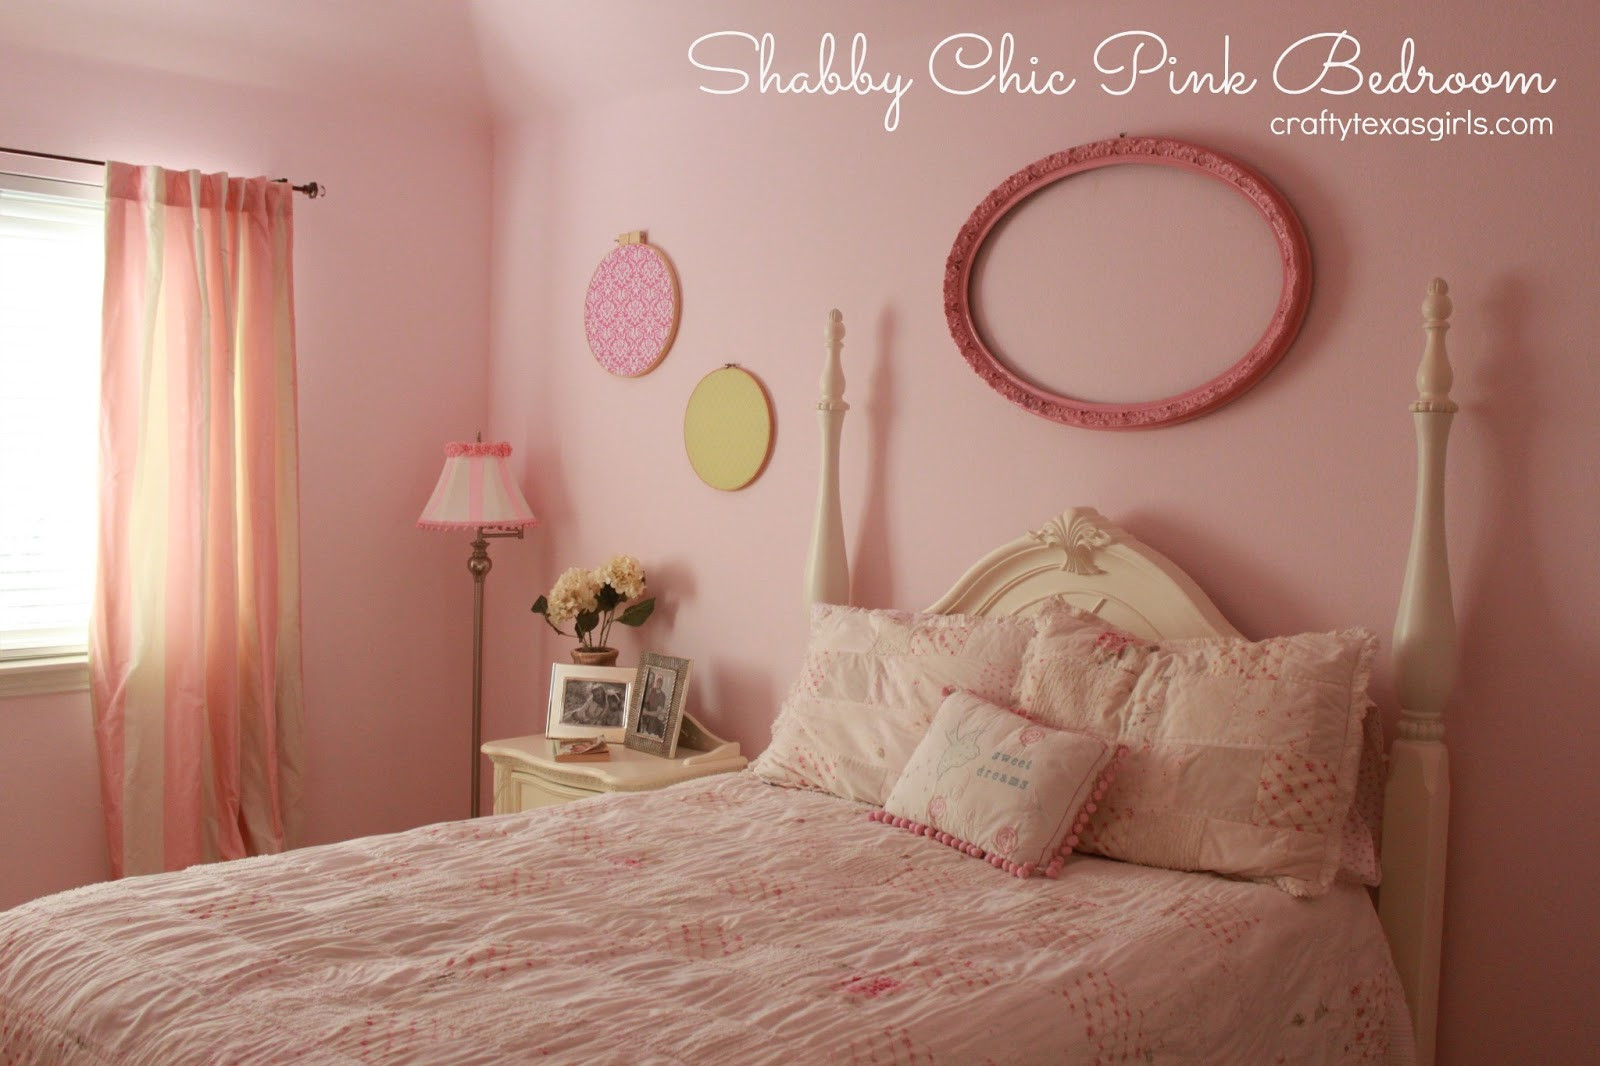 Pink Shabby Chic Bedroom  Crafty Texas Girls Pretty in Pink Shabby Chic Bedroom